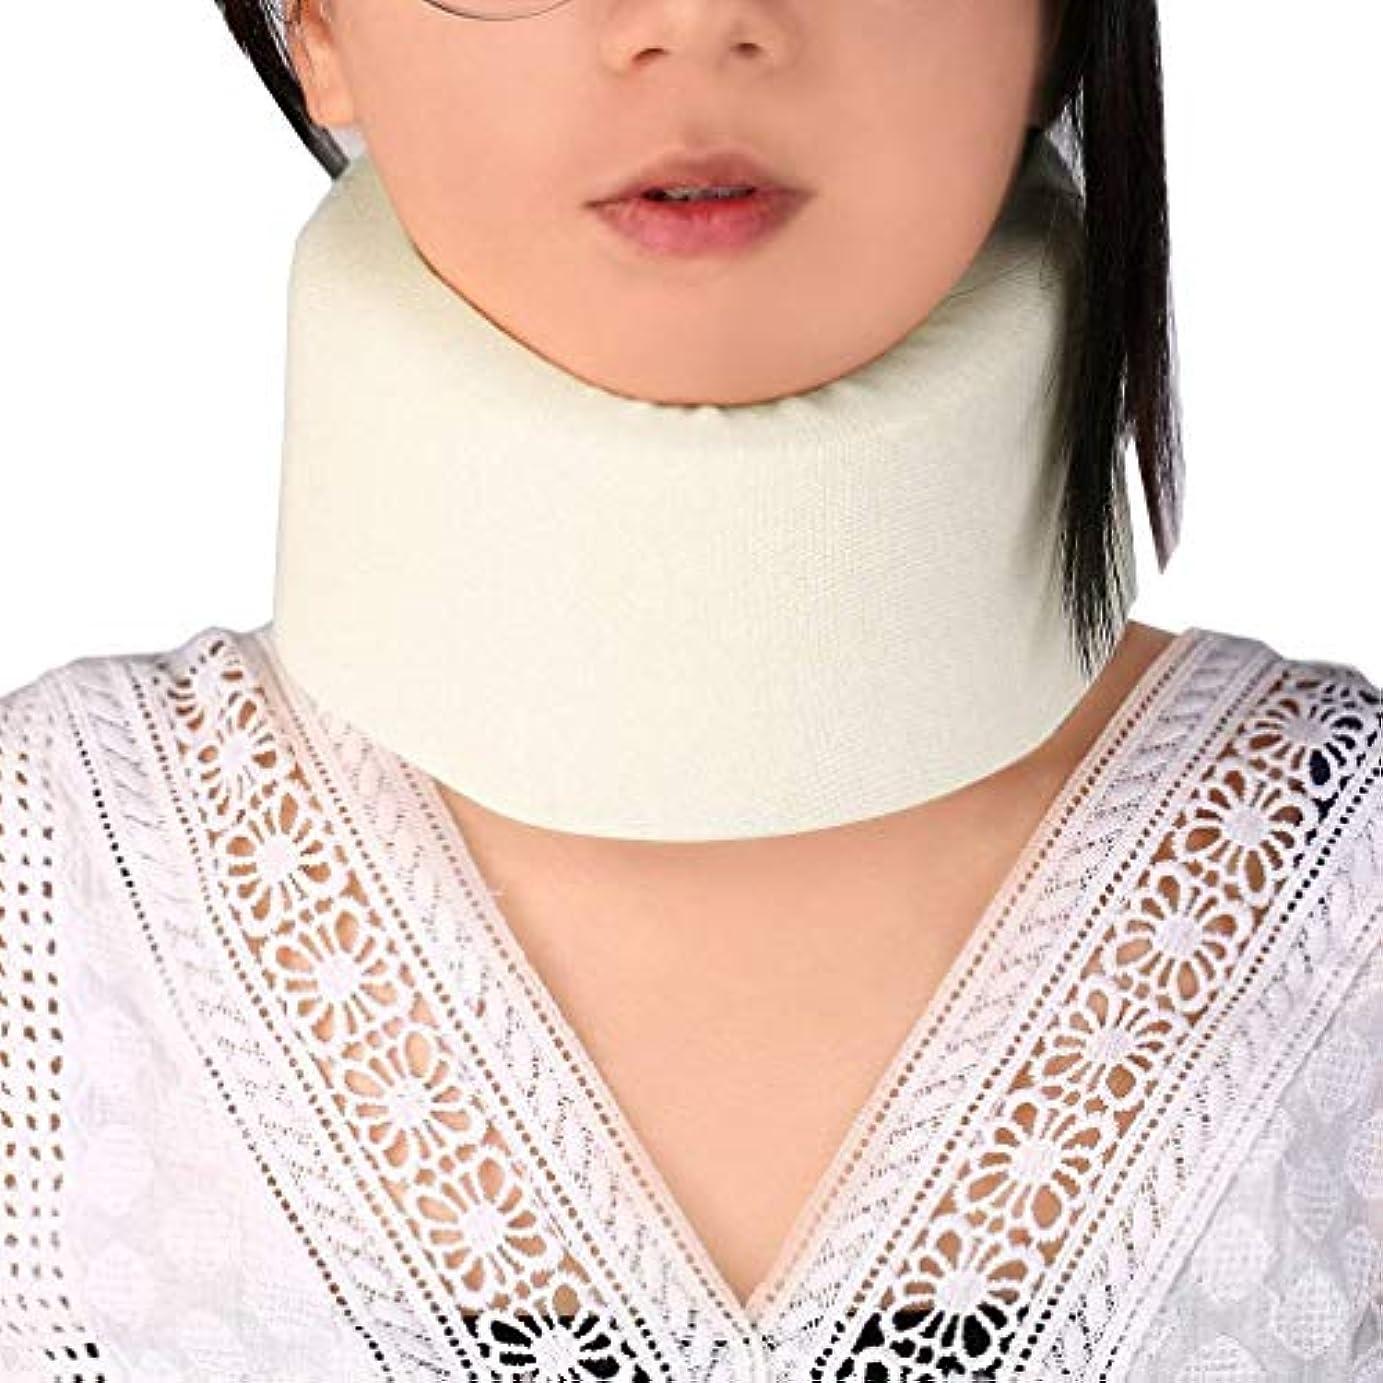 Oral Dentistry 首 サポーター ソフト 頸椎 首こり ソフト頸椎カラー 肩の痛みの軽減 着脱 簡単 男女兼用 ホワイト